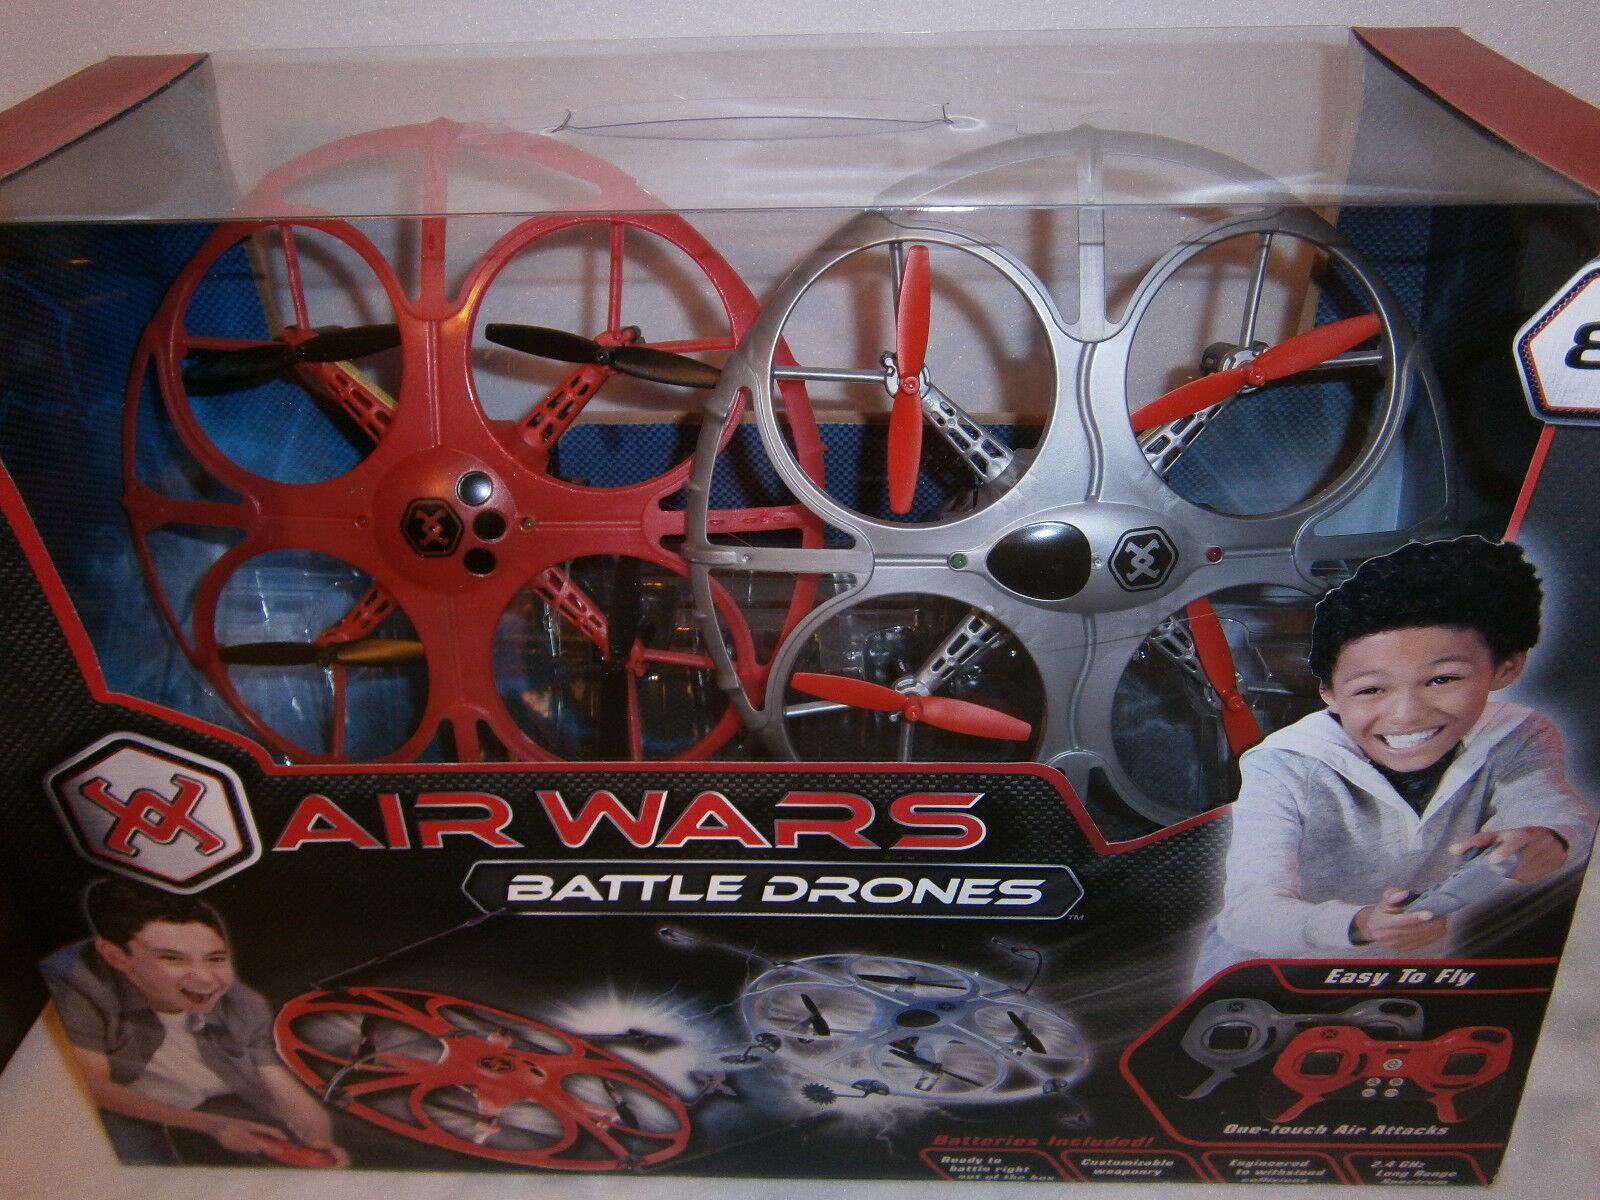 Air guerras Battle  Drones, NIB  ampia selezione